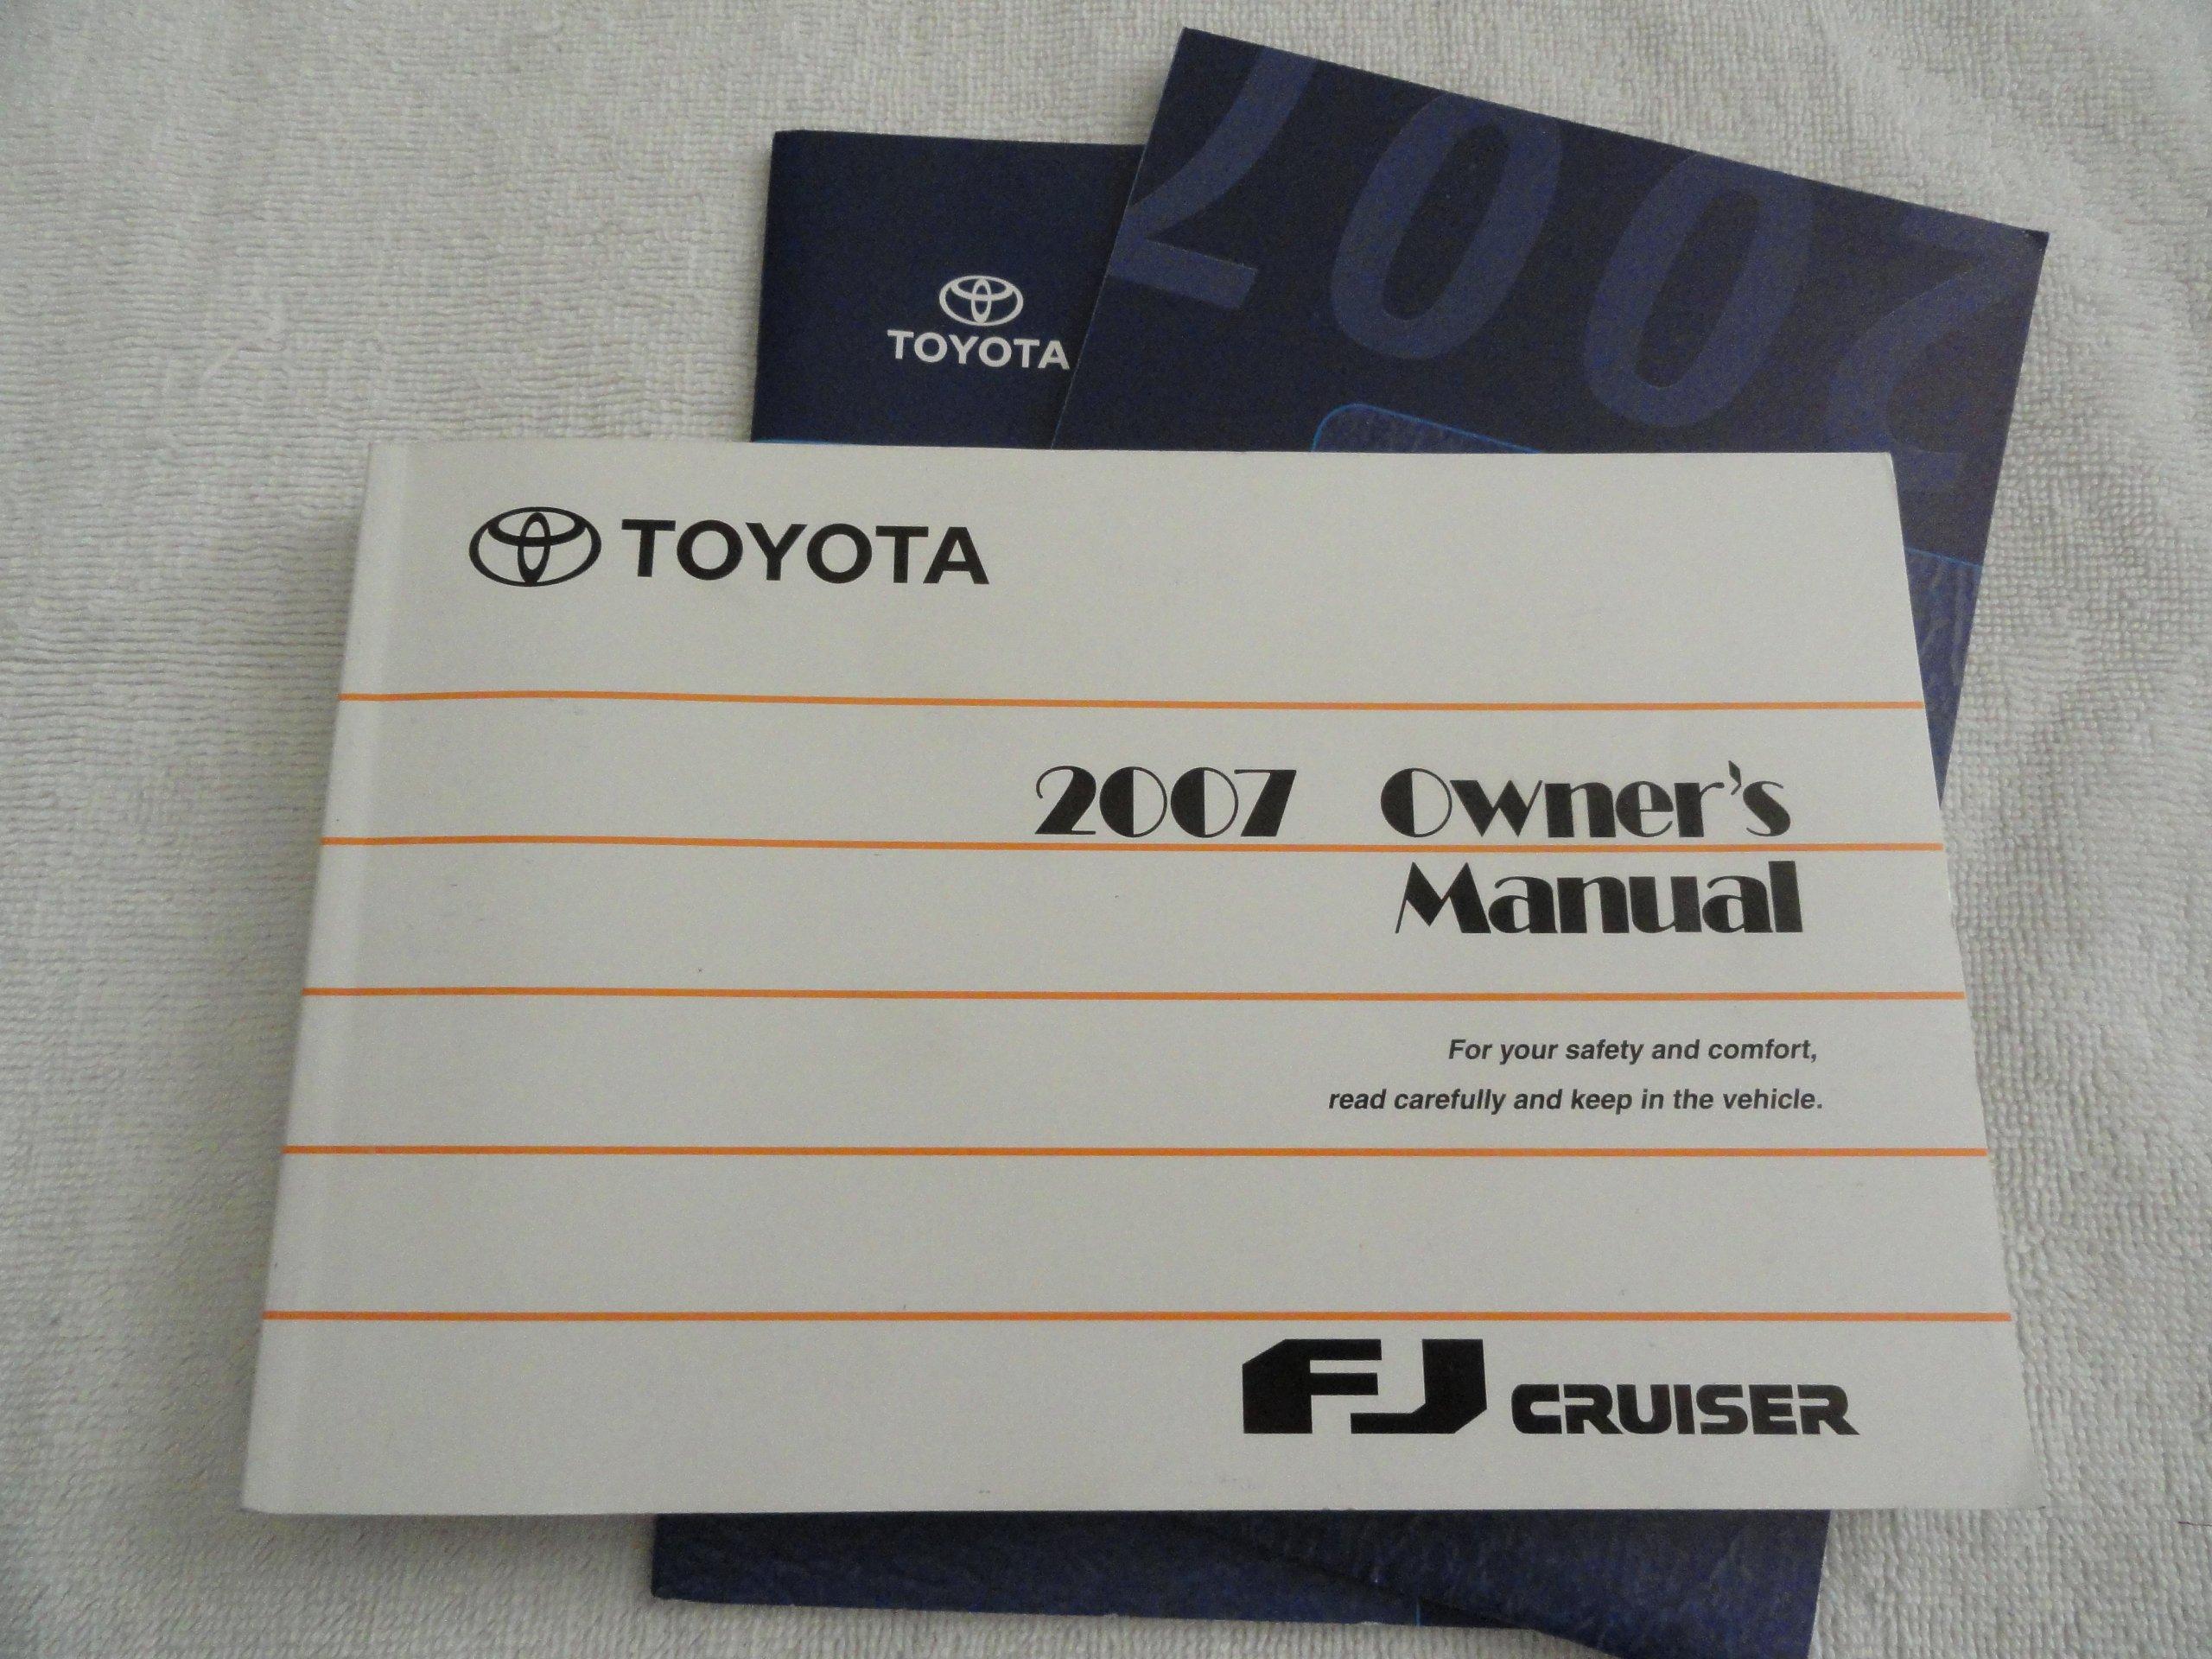 2007 Toyota FJ Cruiser Owners Manual: Toyota Motor Sales CO. LTD.:  Amazon.com: Books